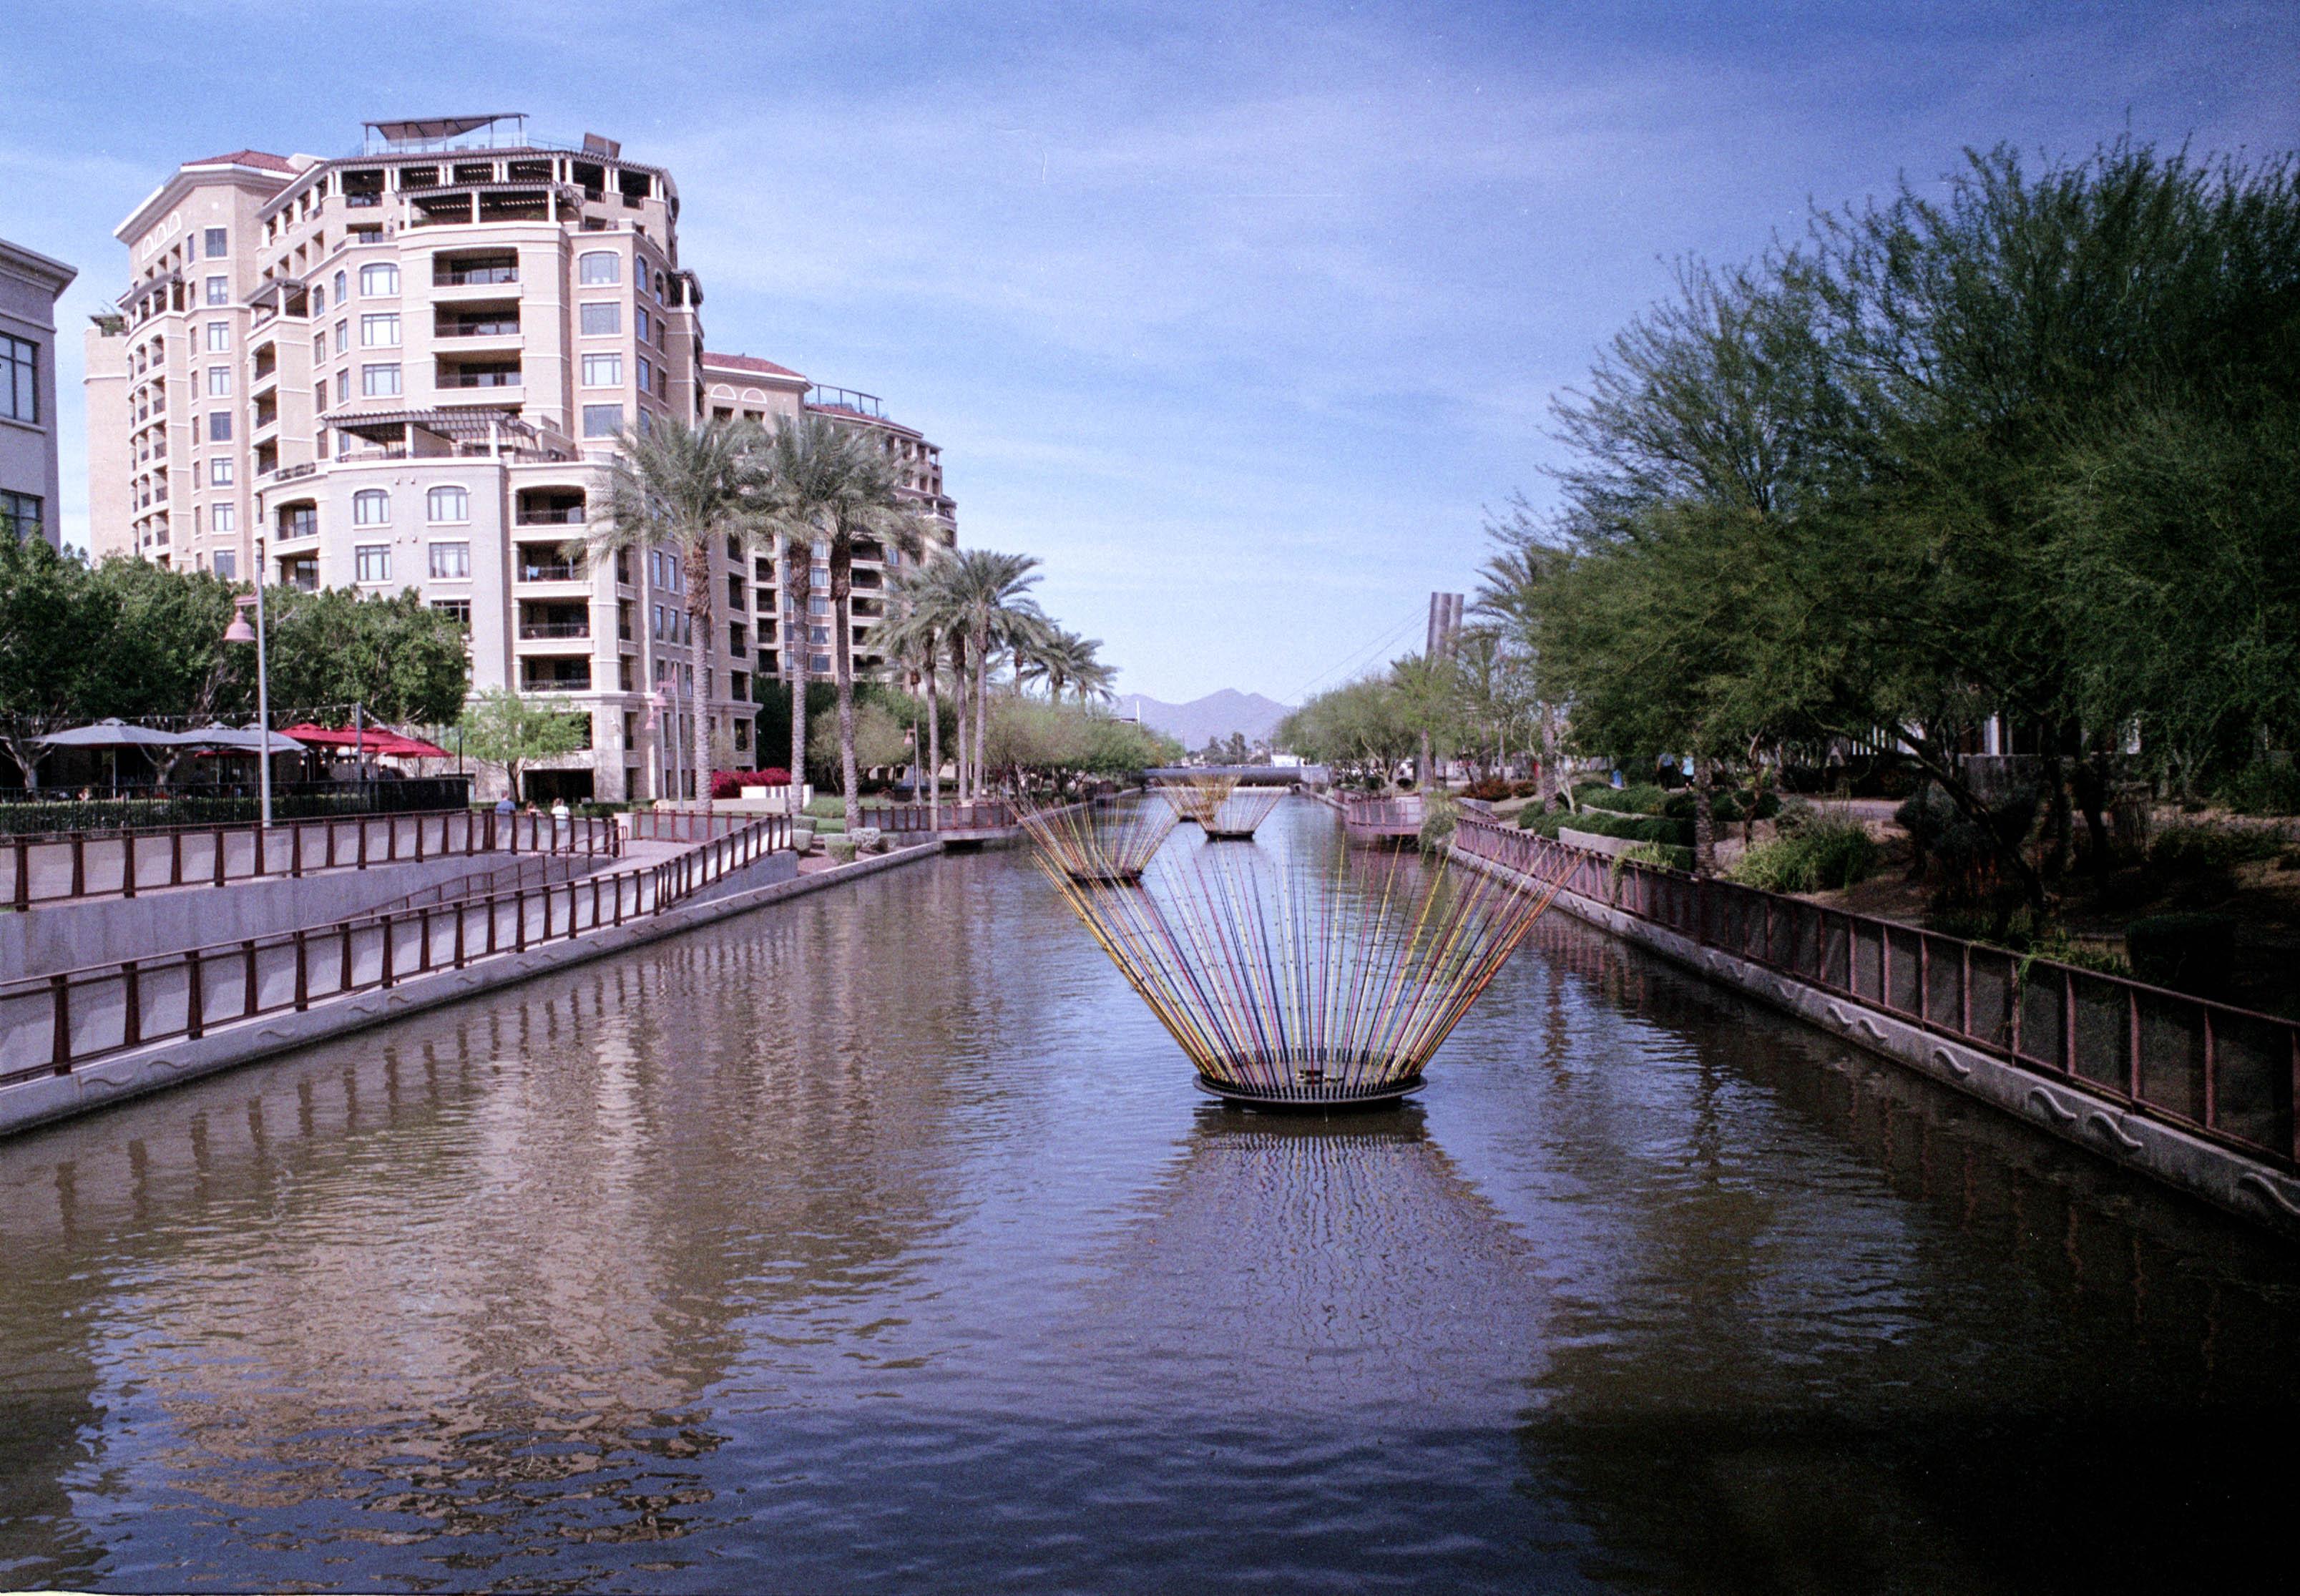 By the Riverwalk